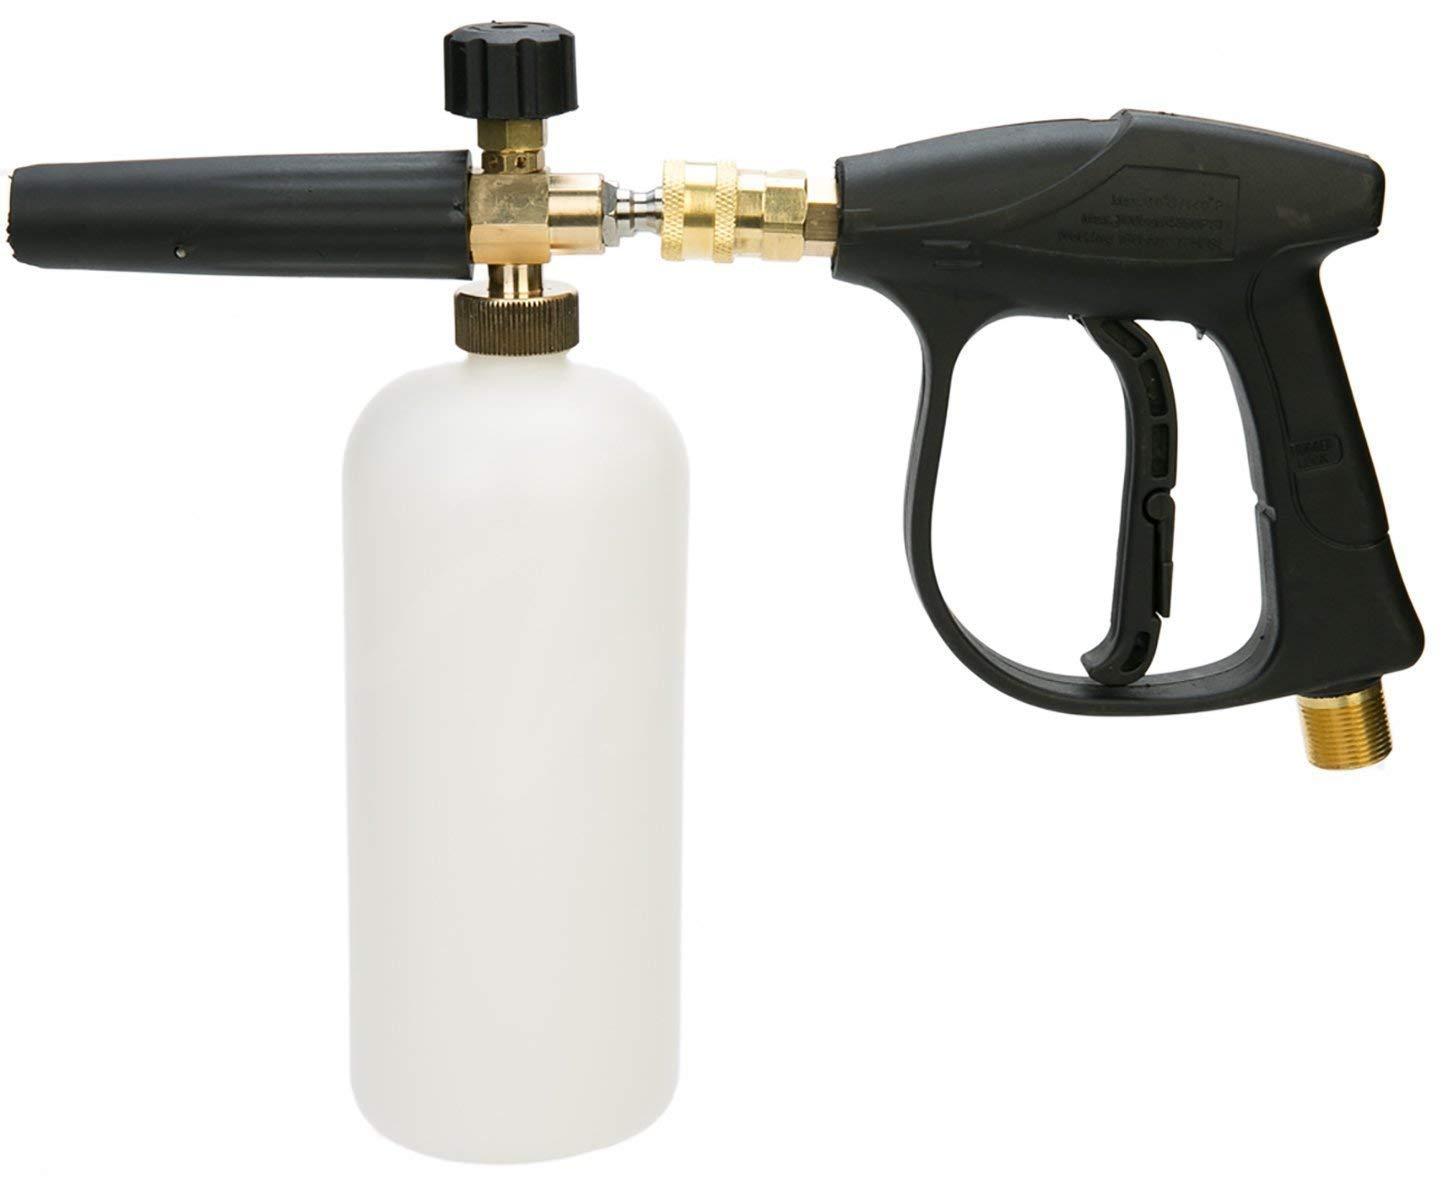 Automobiles & Motorcycles 1l High Pressure Foam Gun Water Bottle Quick Release Professional Foam Generator Car Washer Car Washer